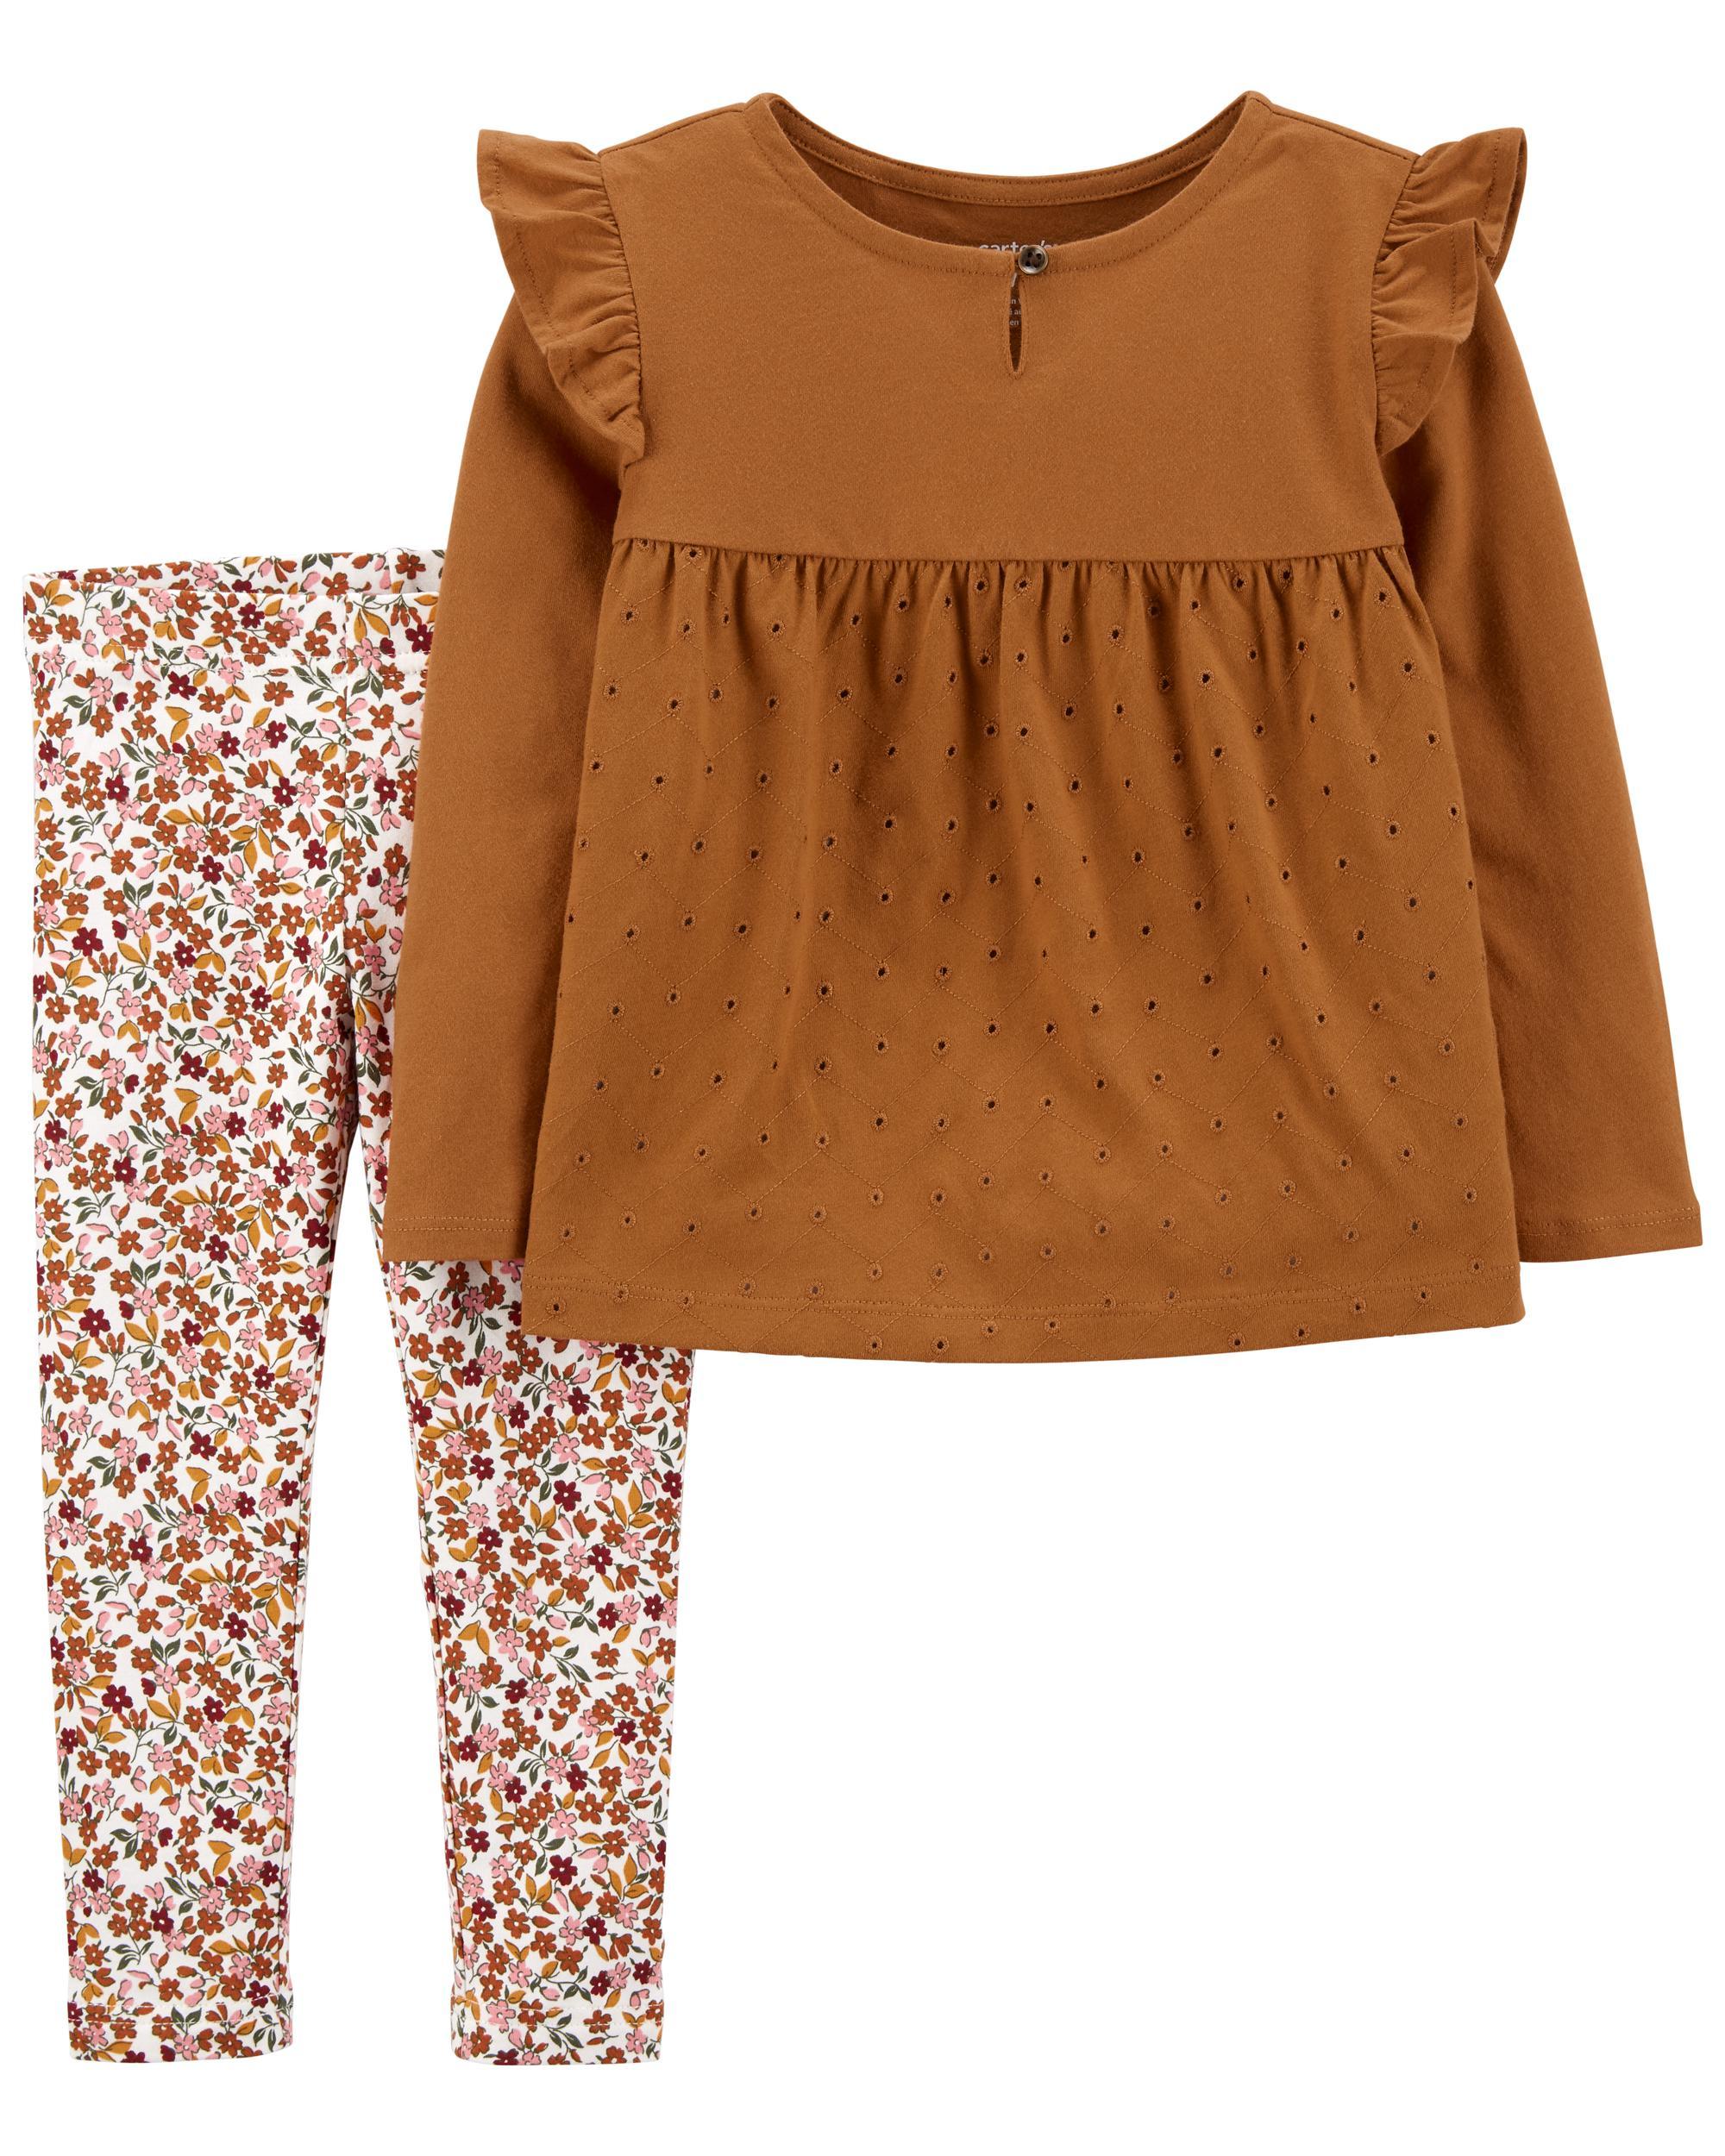 Carters 2-Piece Eyelet Jersey Top & Floral Leggings